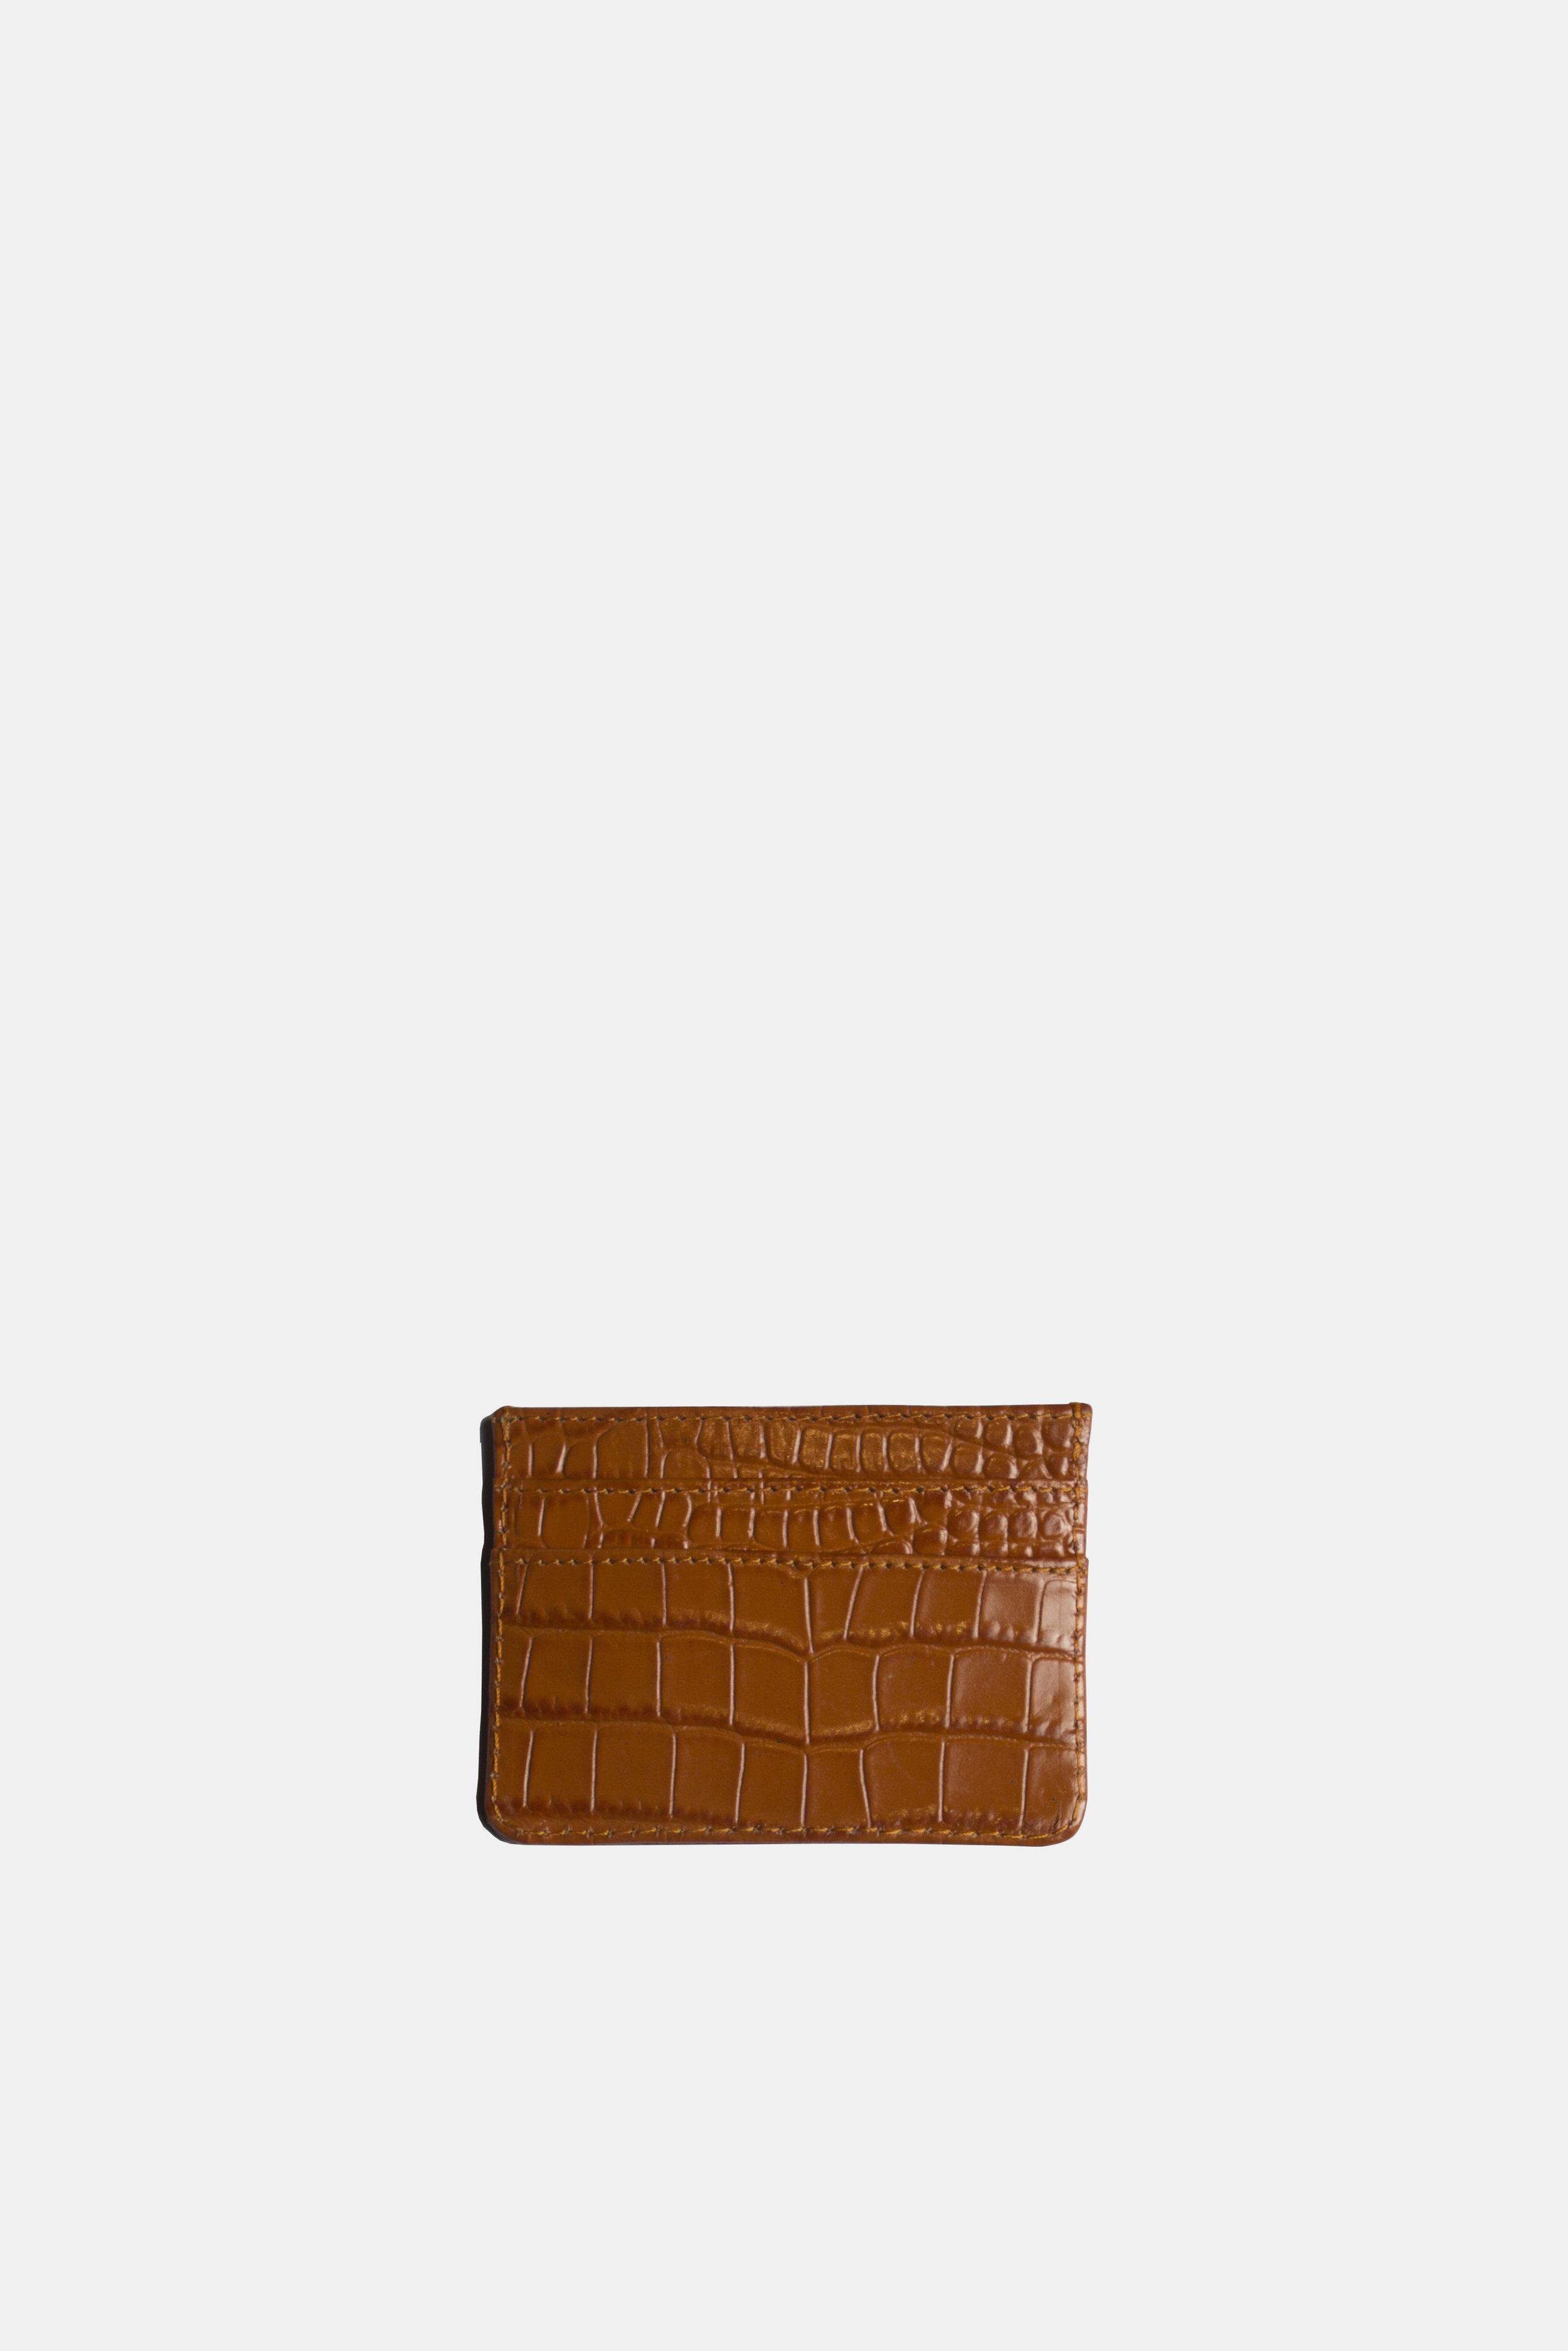 CROC CARD-HOLDER - 170.000 COP